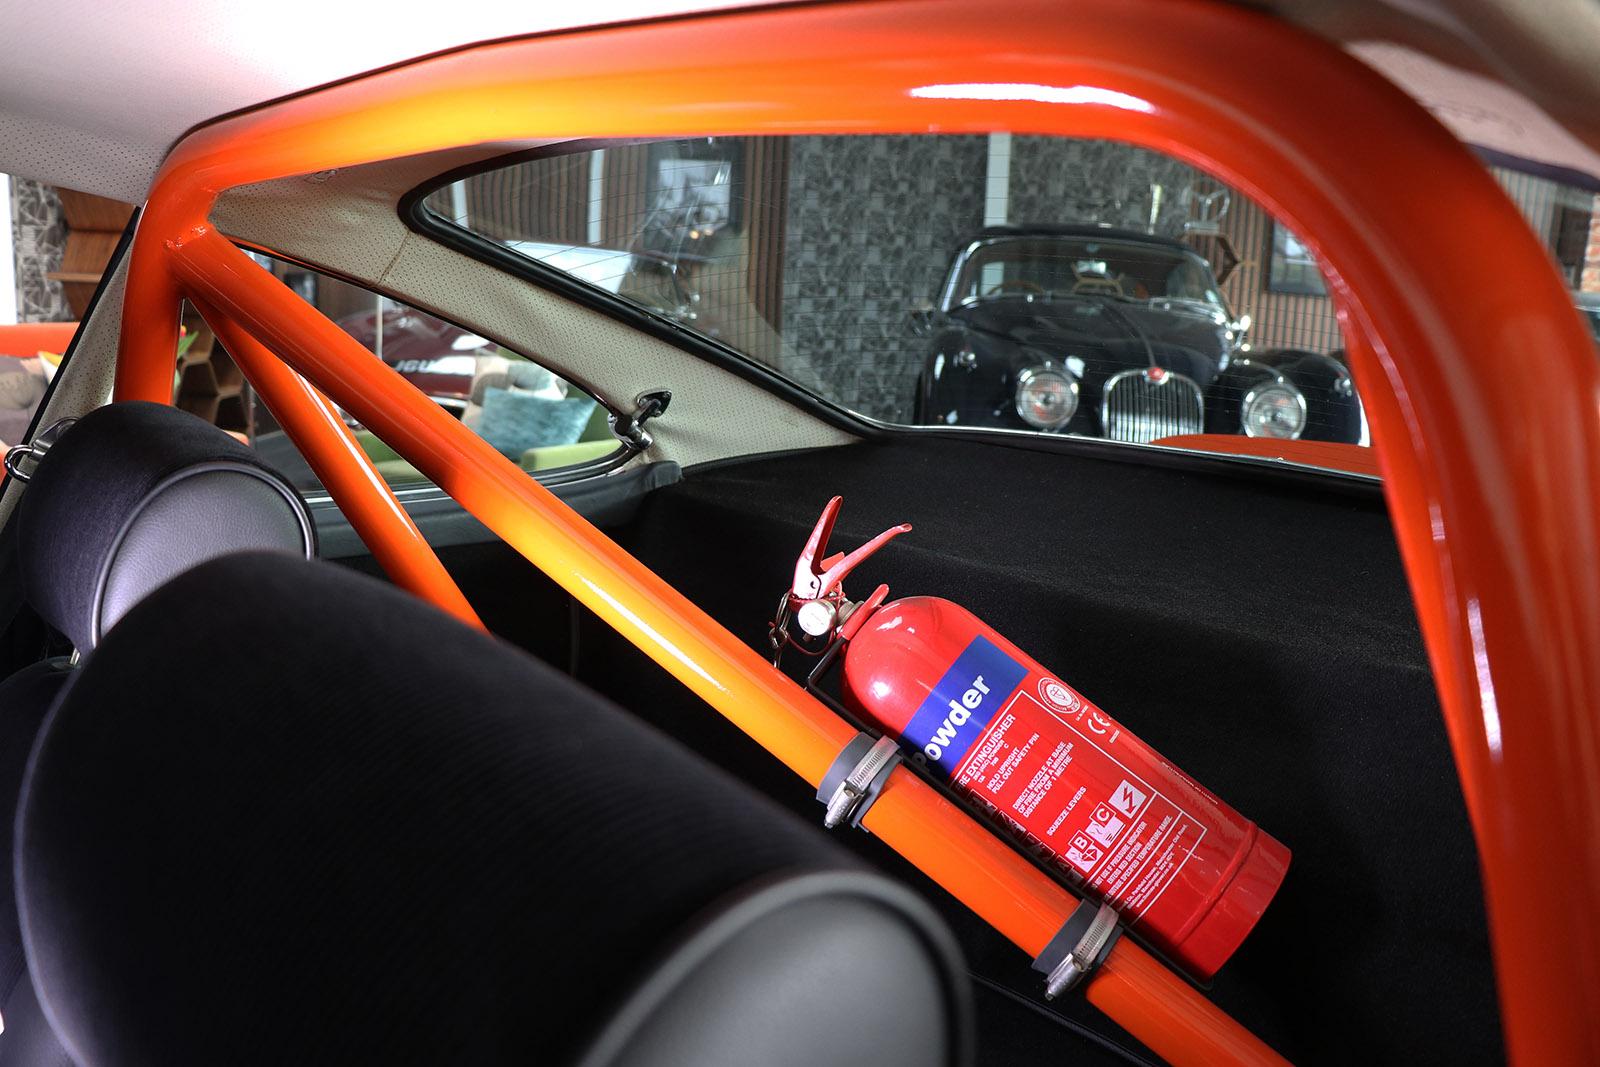 1972-Porsche 911 S-orange-evocation-sayer selection-19-web.jpg